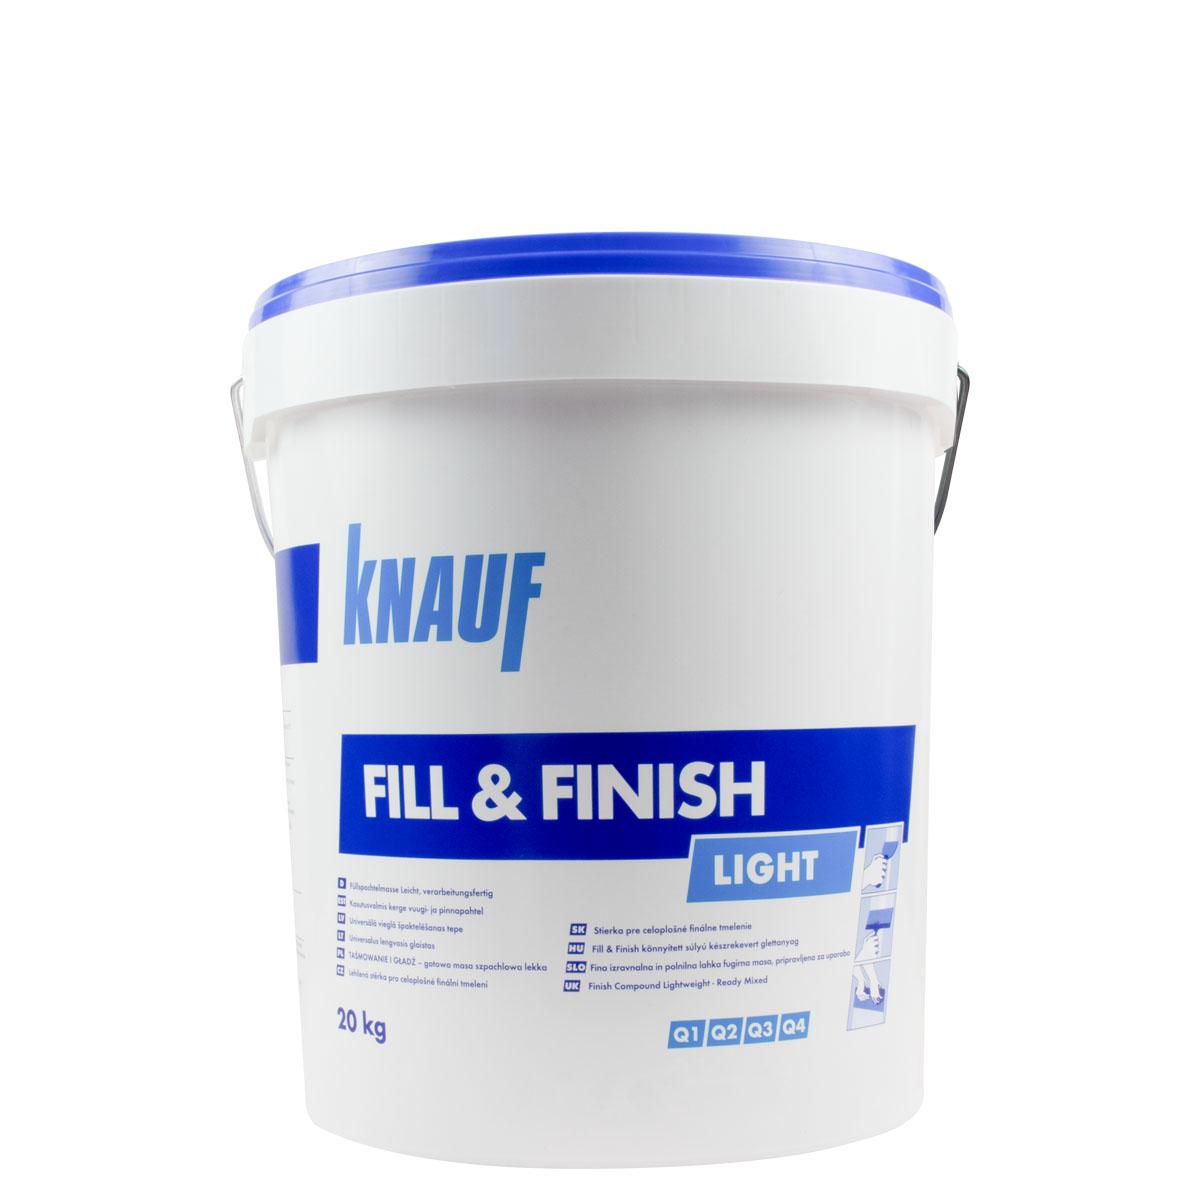 Knauf Fill & Finish Light 20KG ,Sheetrock, Füll- und Feinspachtelmasse